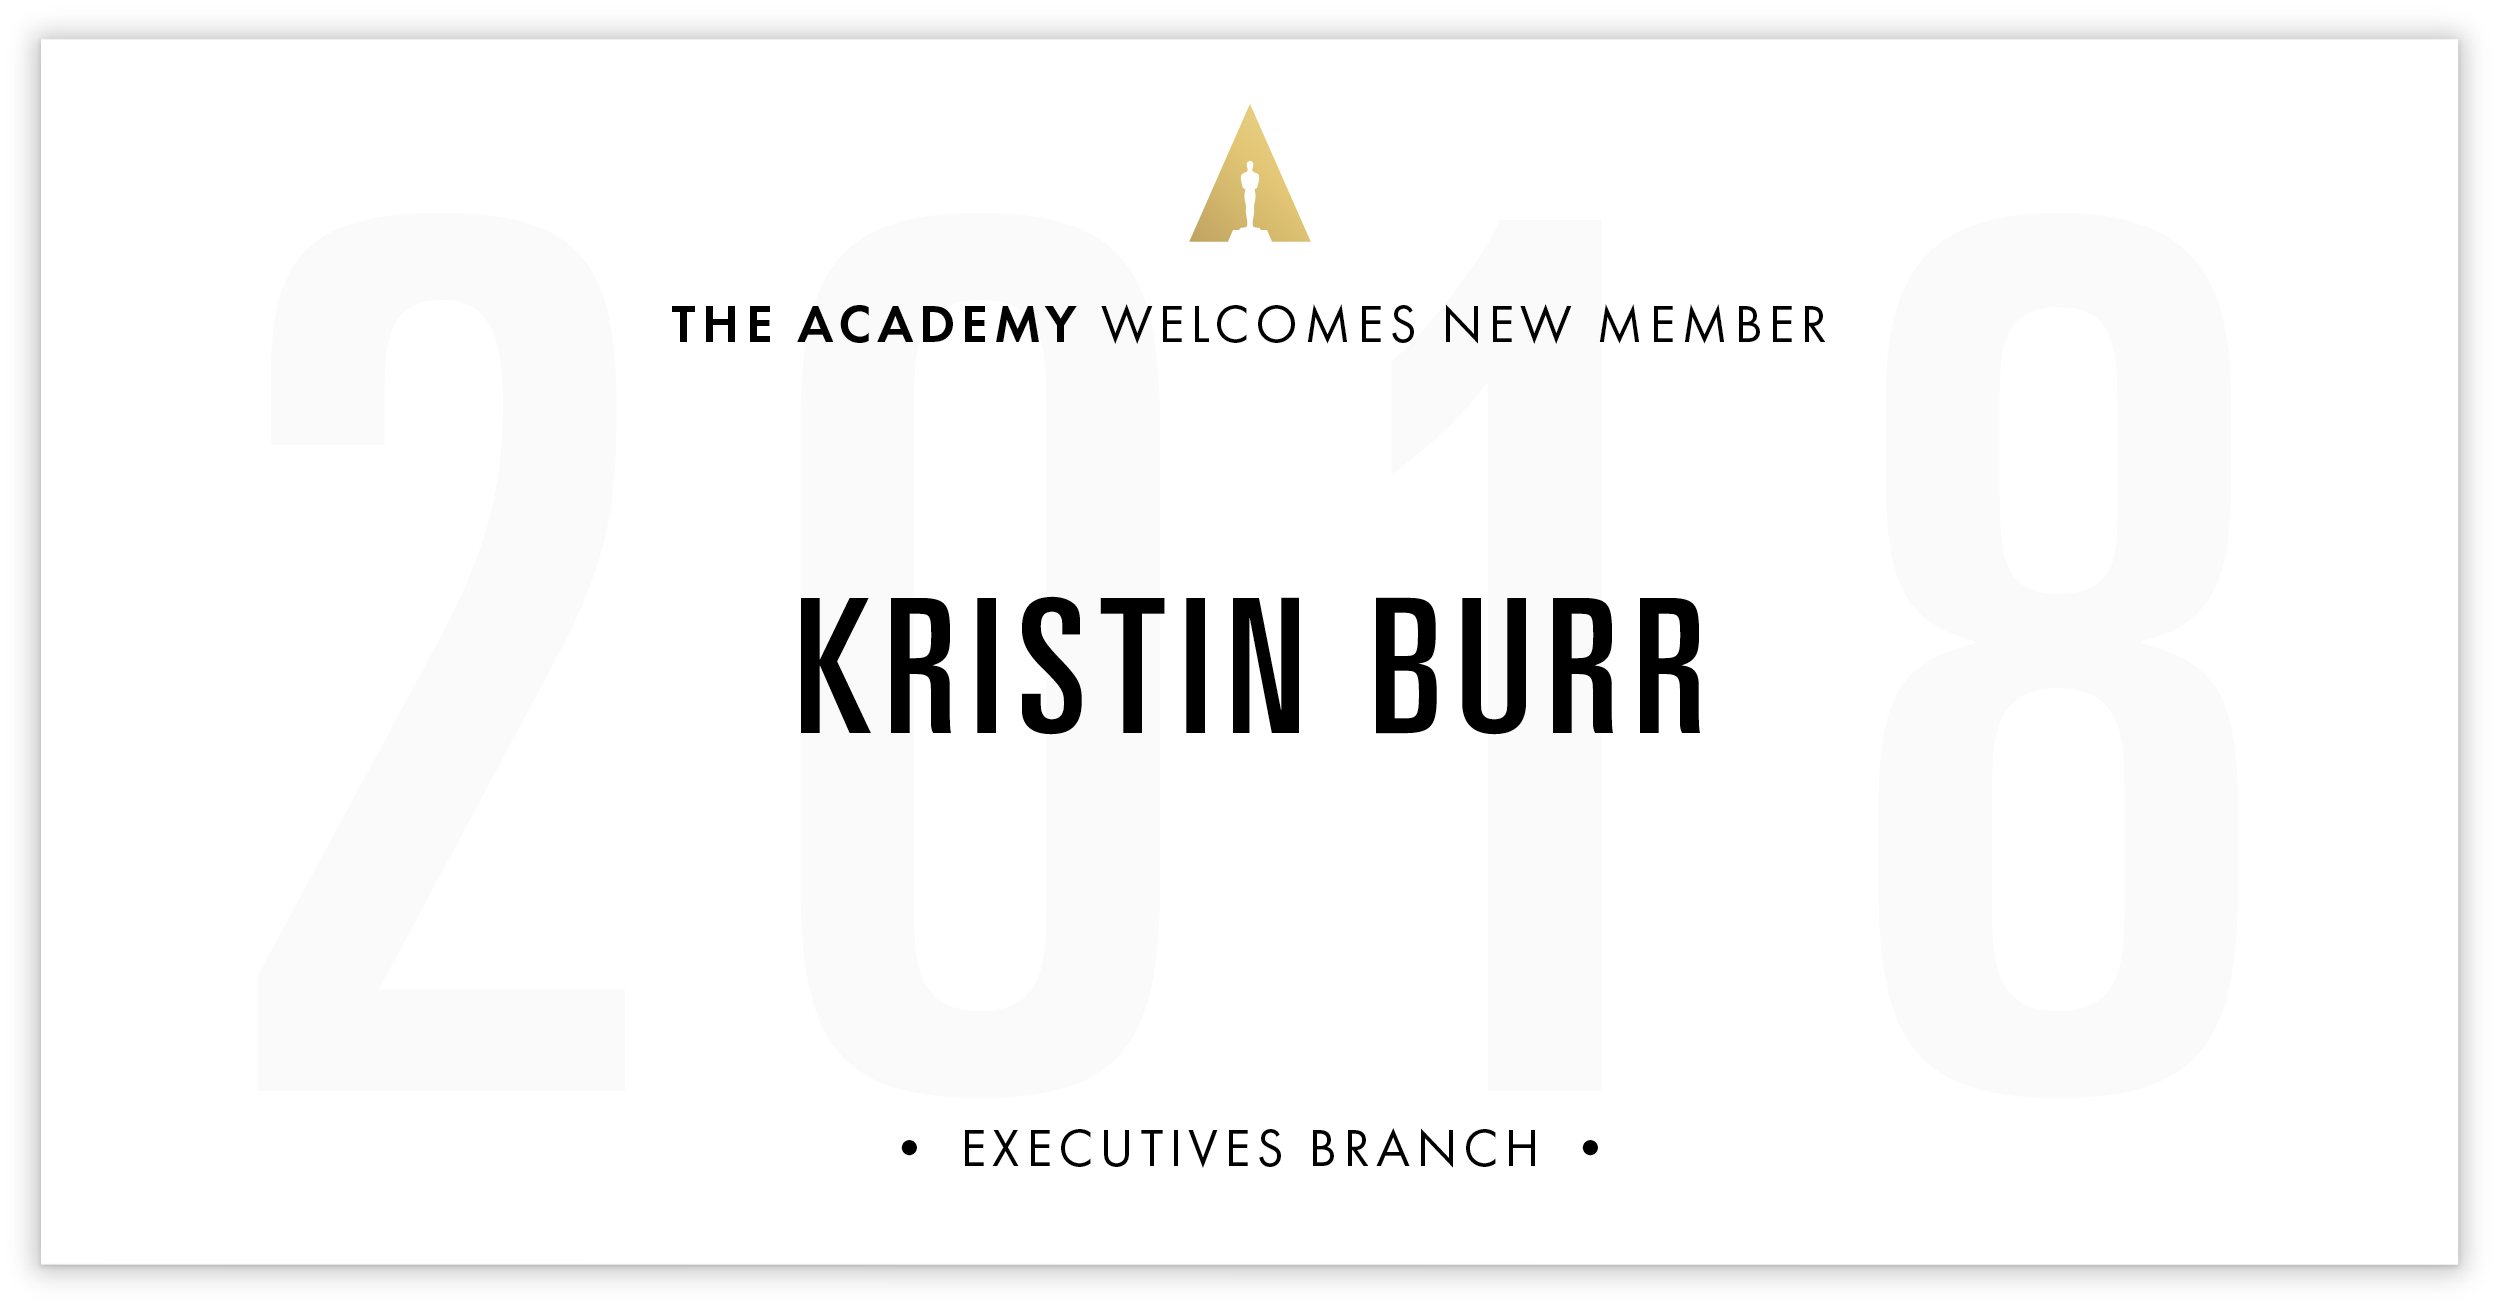 Kristin Burr is invited!